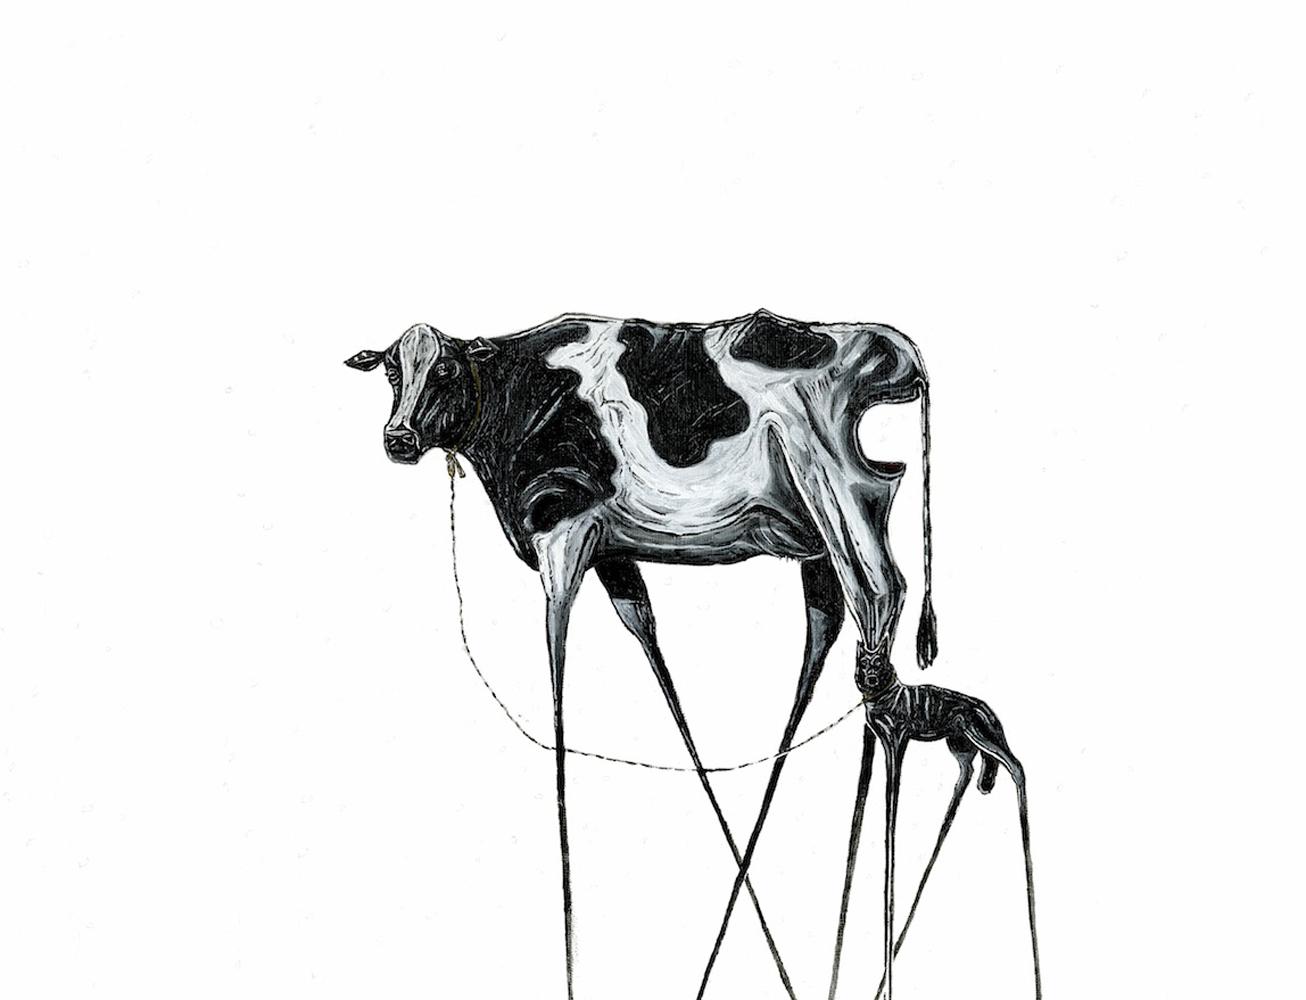 dazed cow tied to black dog.jpg